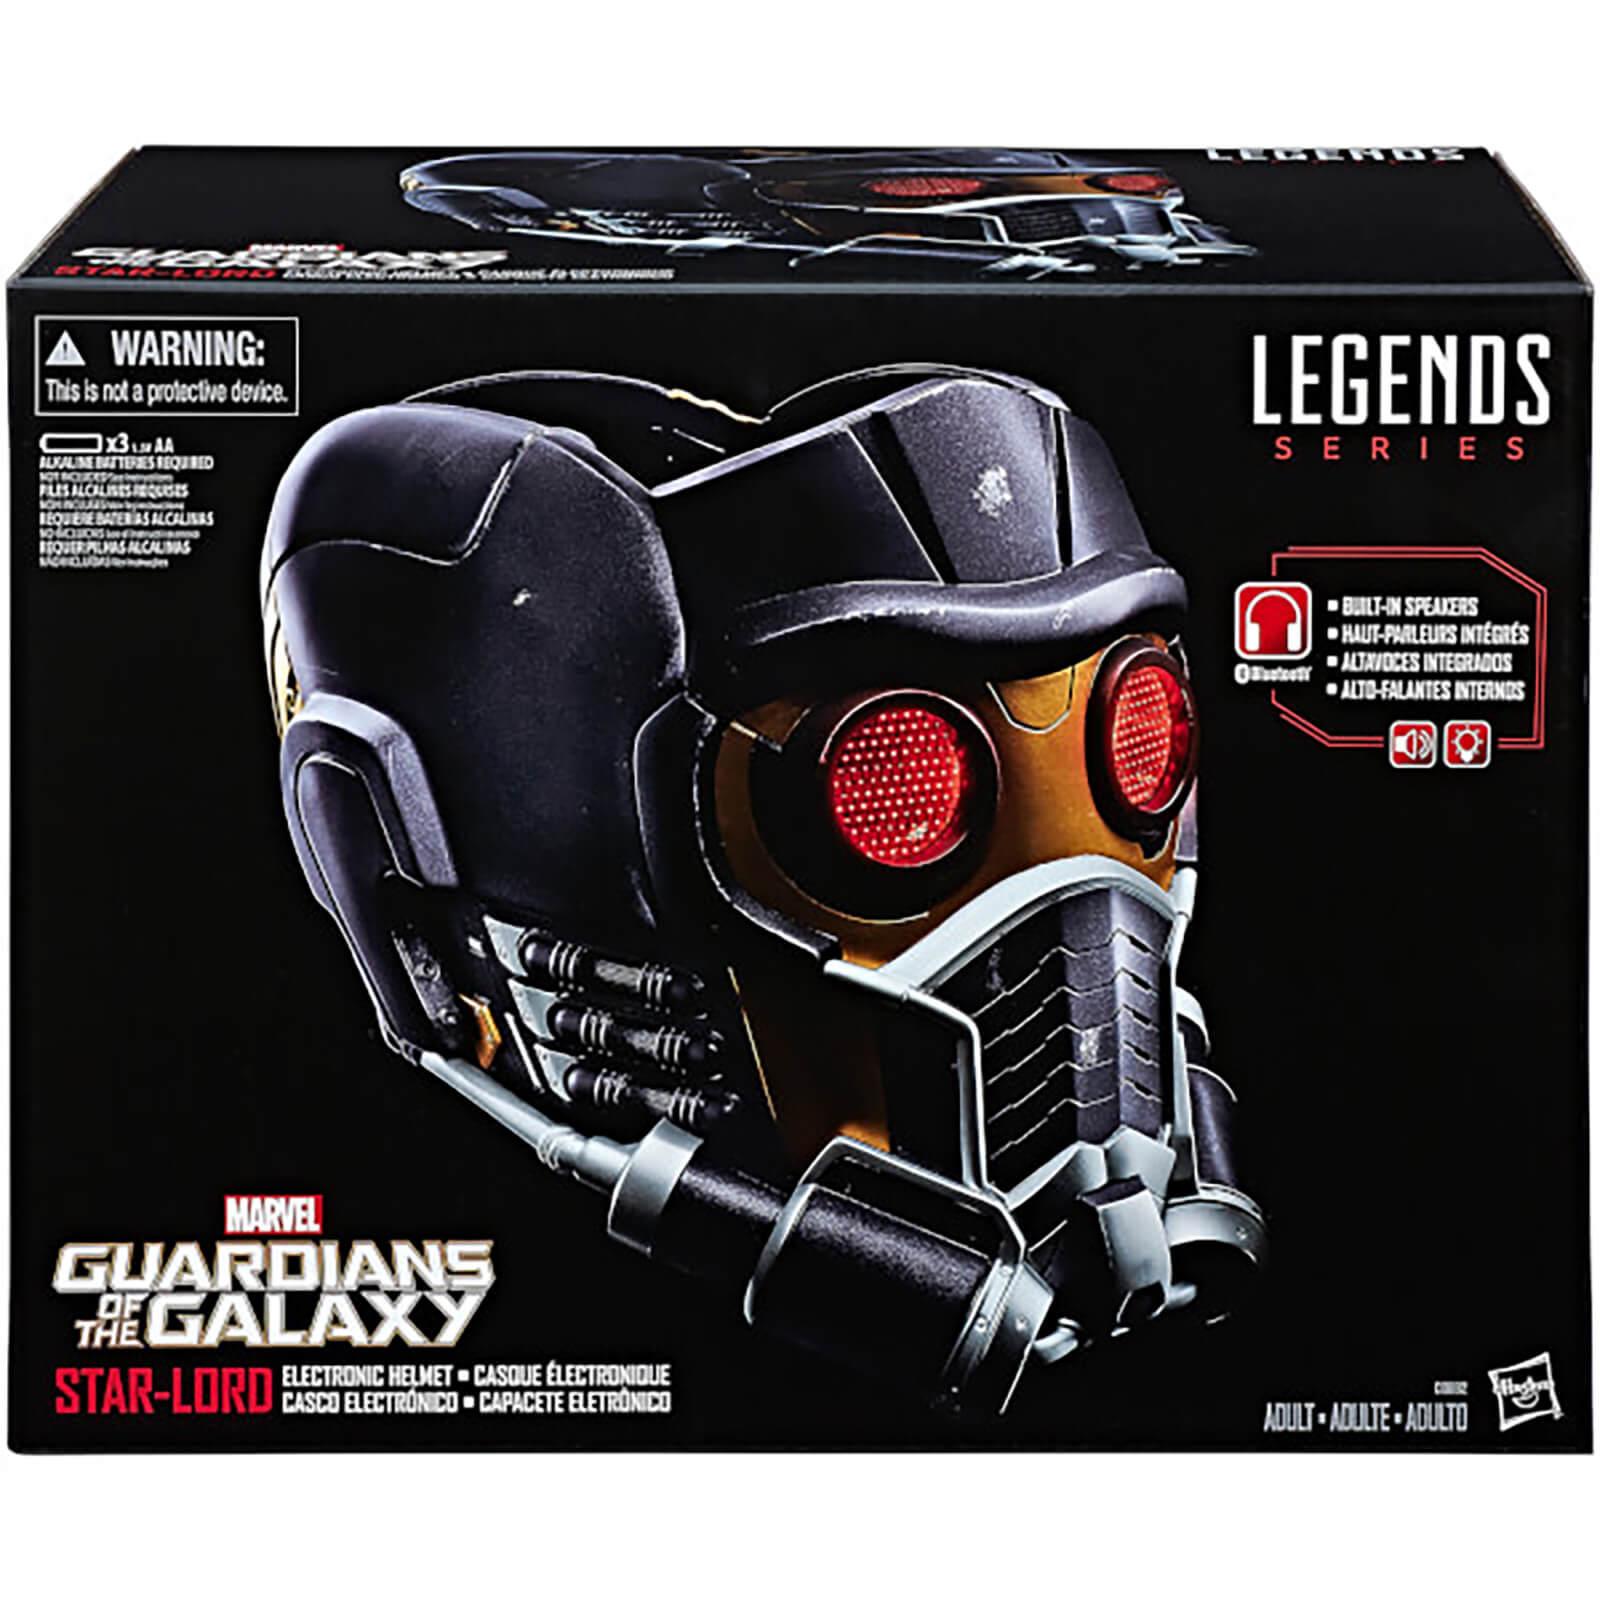 Hasbro Marvel Legends Guardians of the Galaxy Star-Lord Helmet